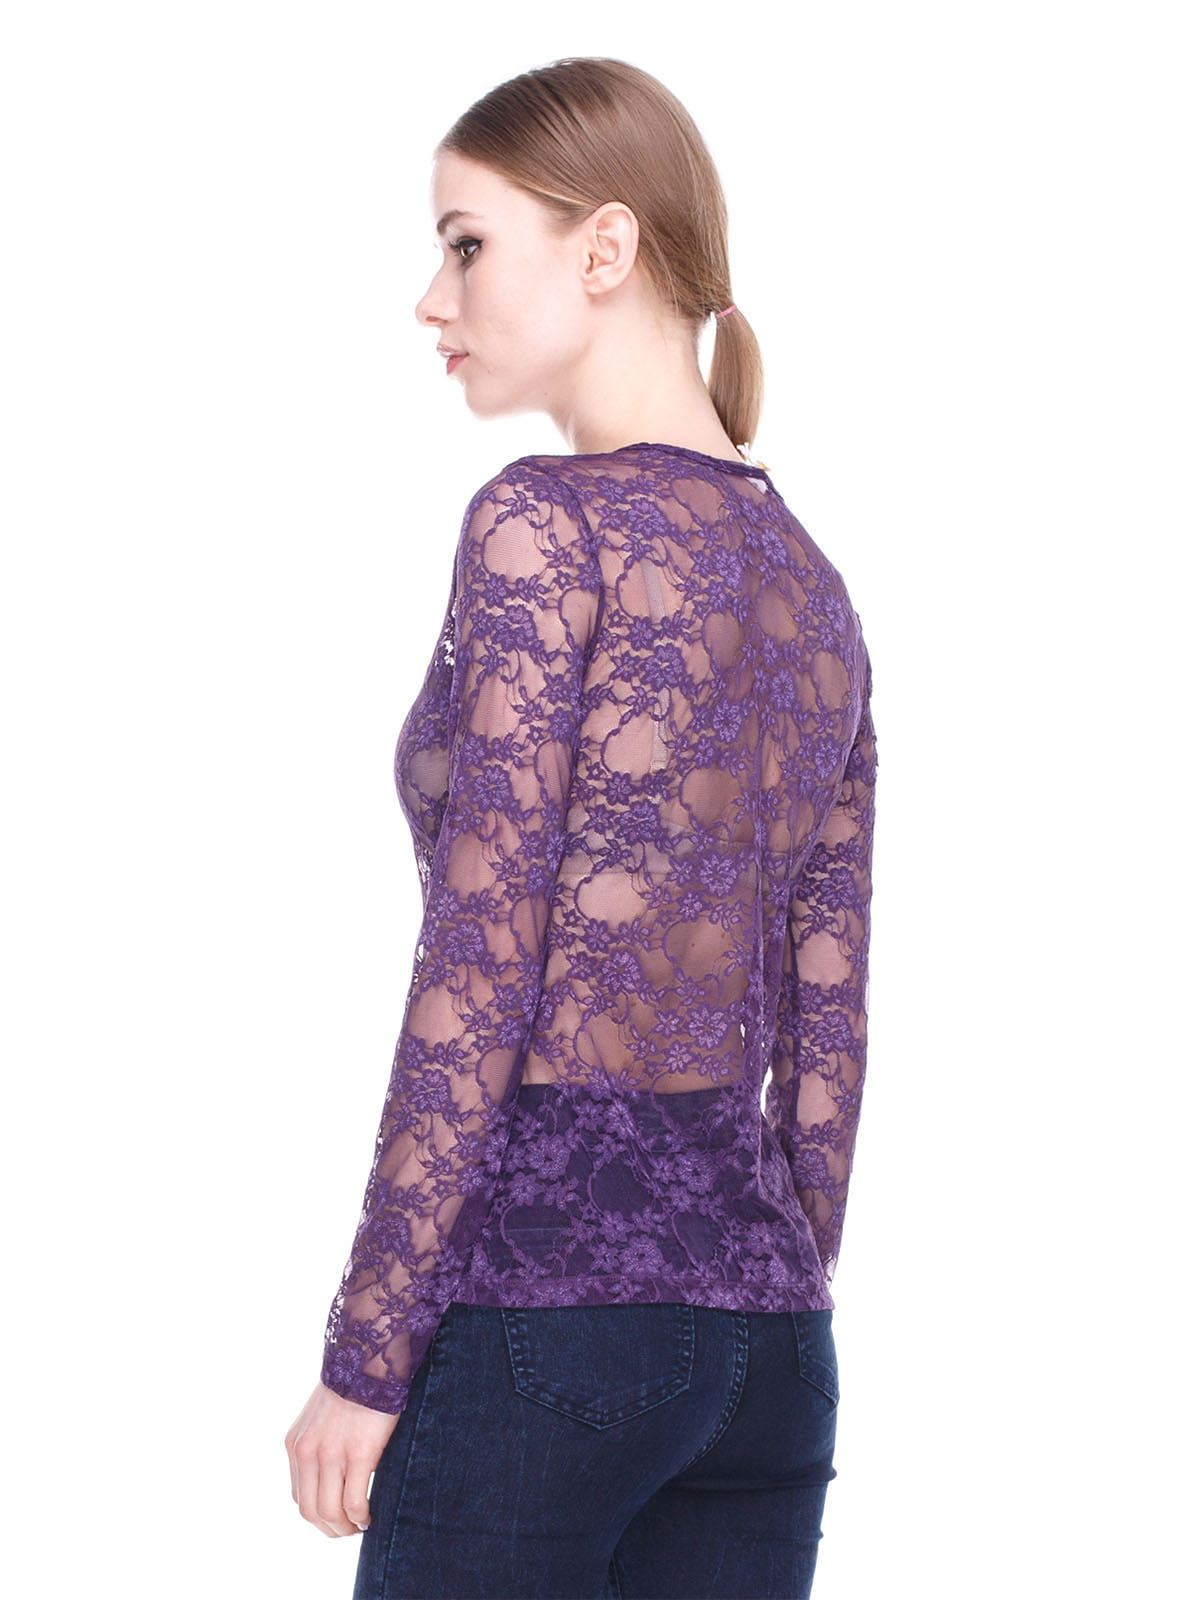 Блуза фіолетова ажурна | 2108984 | фото 2